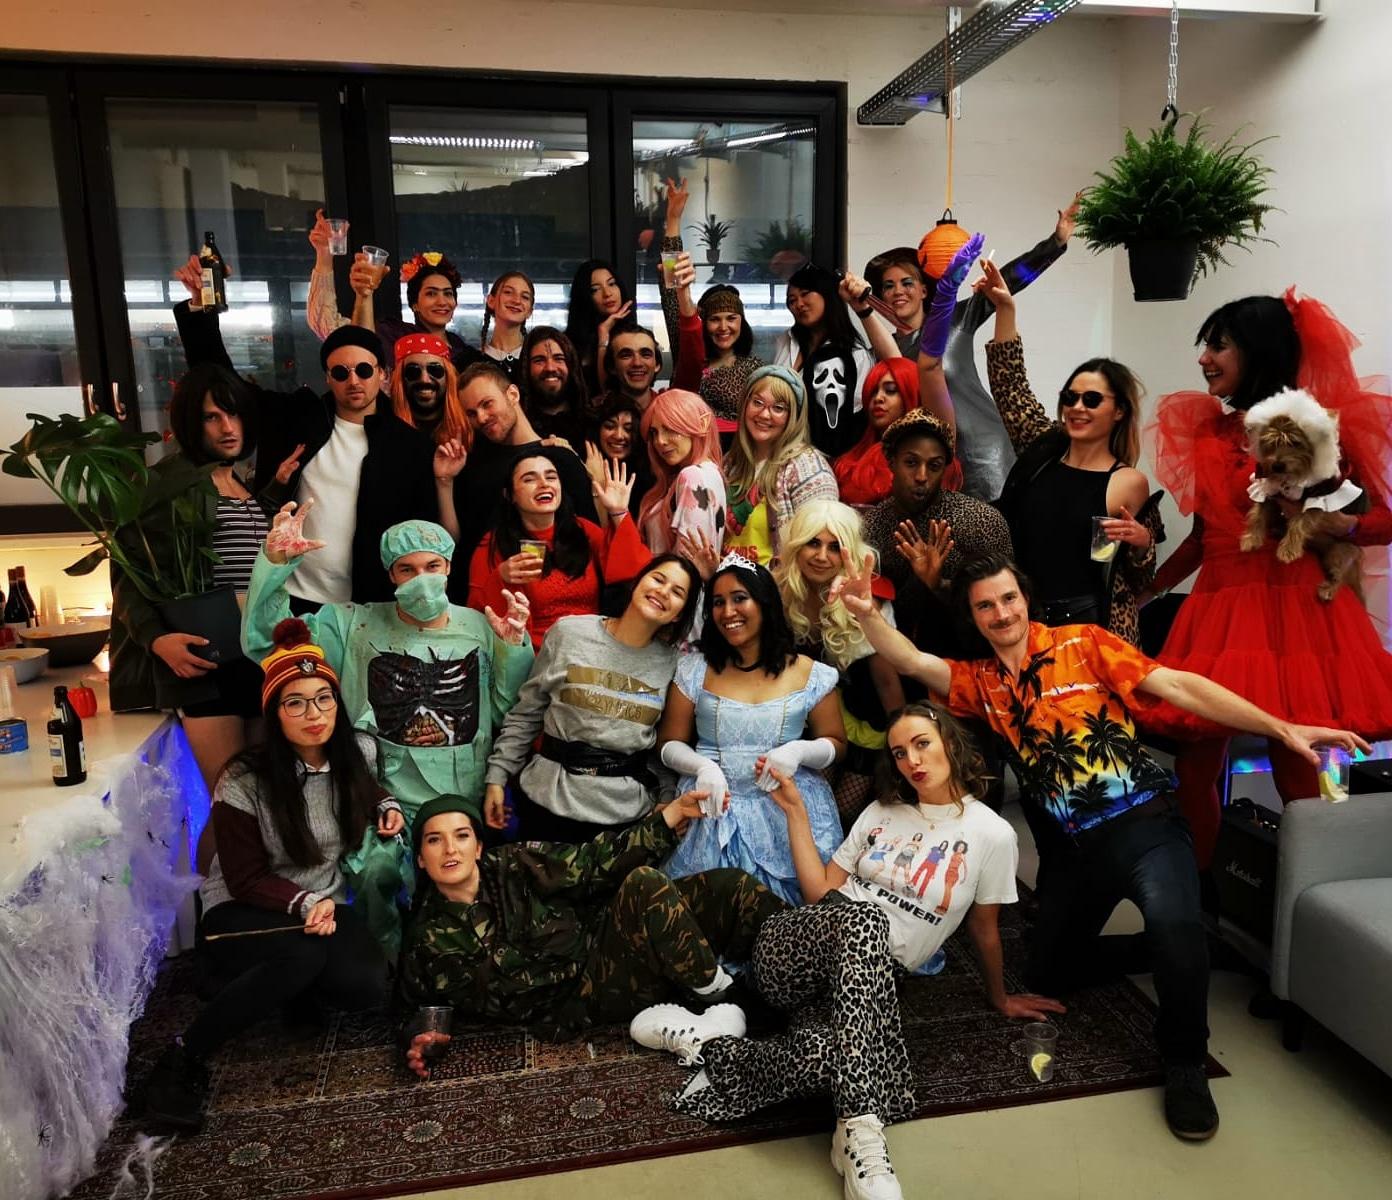 Medbelle Team Spirit - Halloween Party